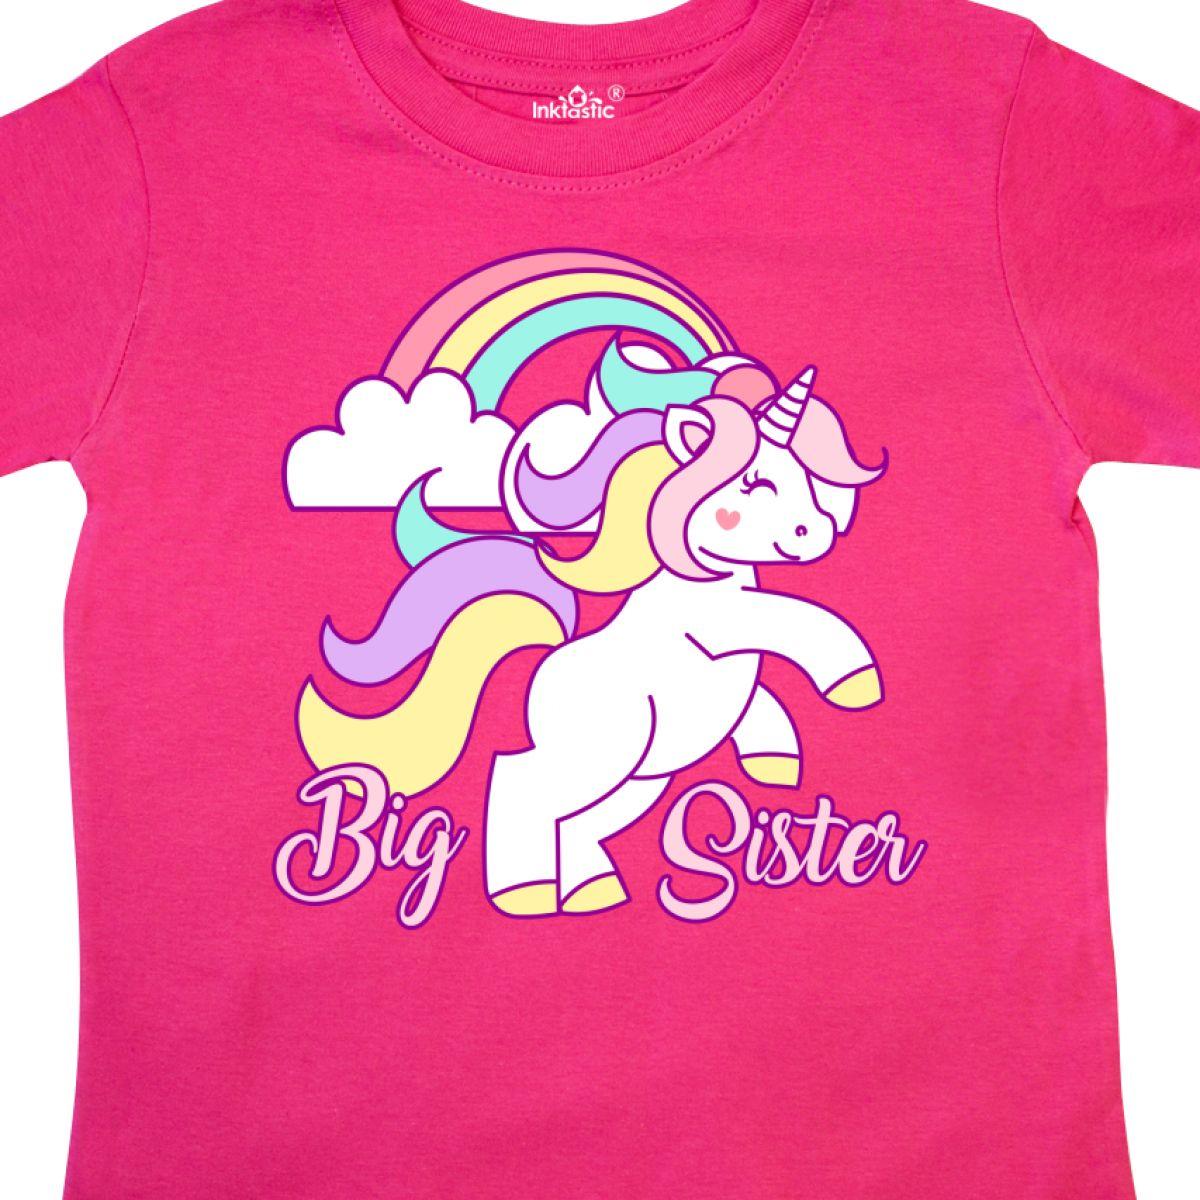 Inktastic-Big-Sister-Unicorn-Toddler-T-Shirt-Fantasy-Happy-Child-Preschooler-Kid thumbnail 4